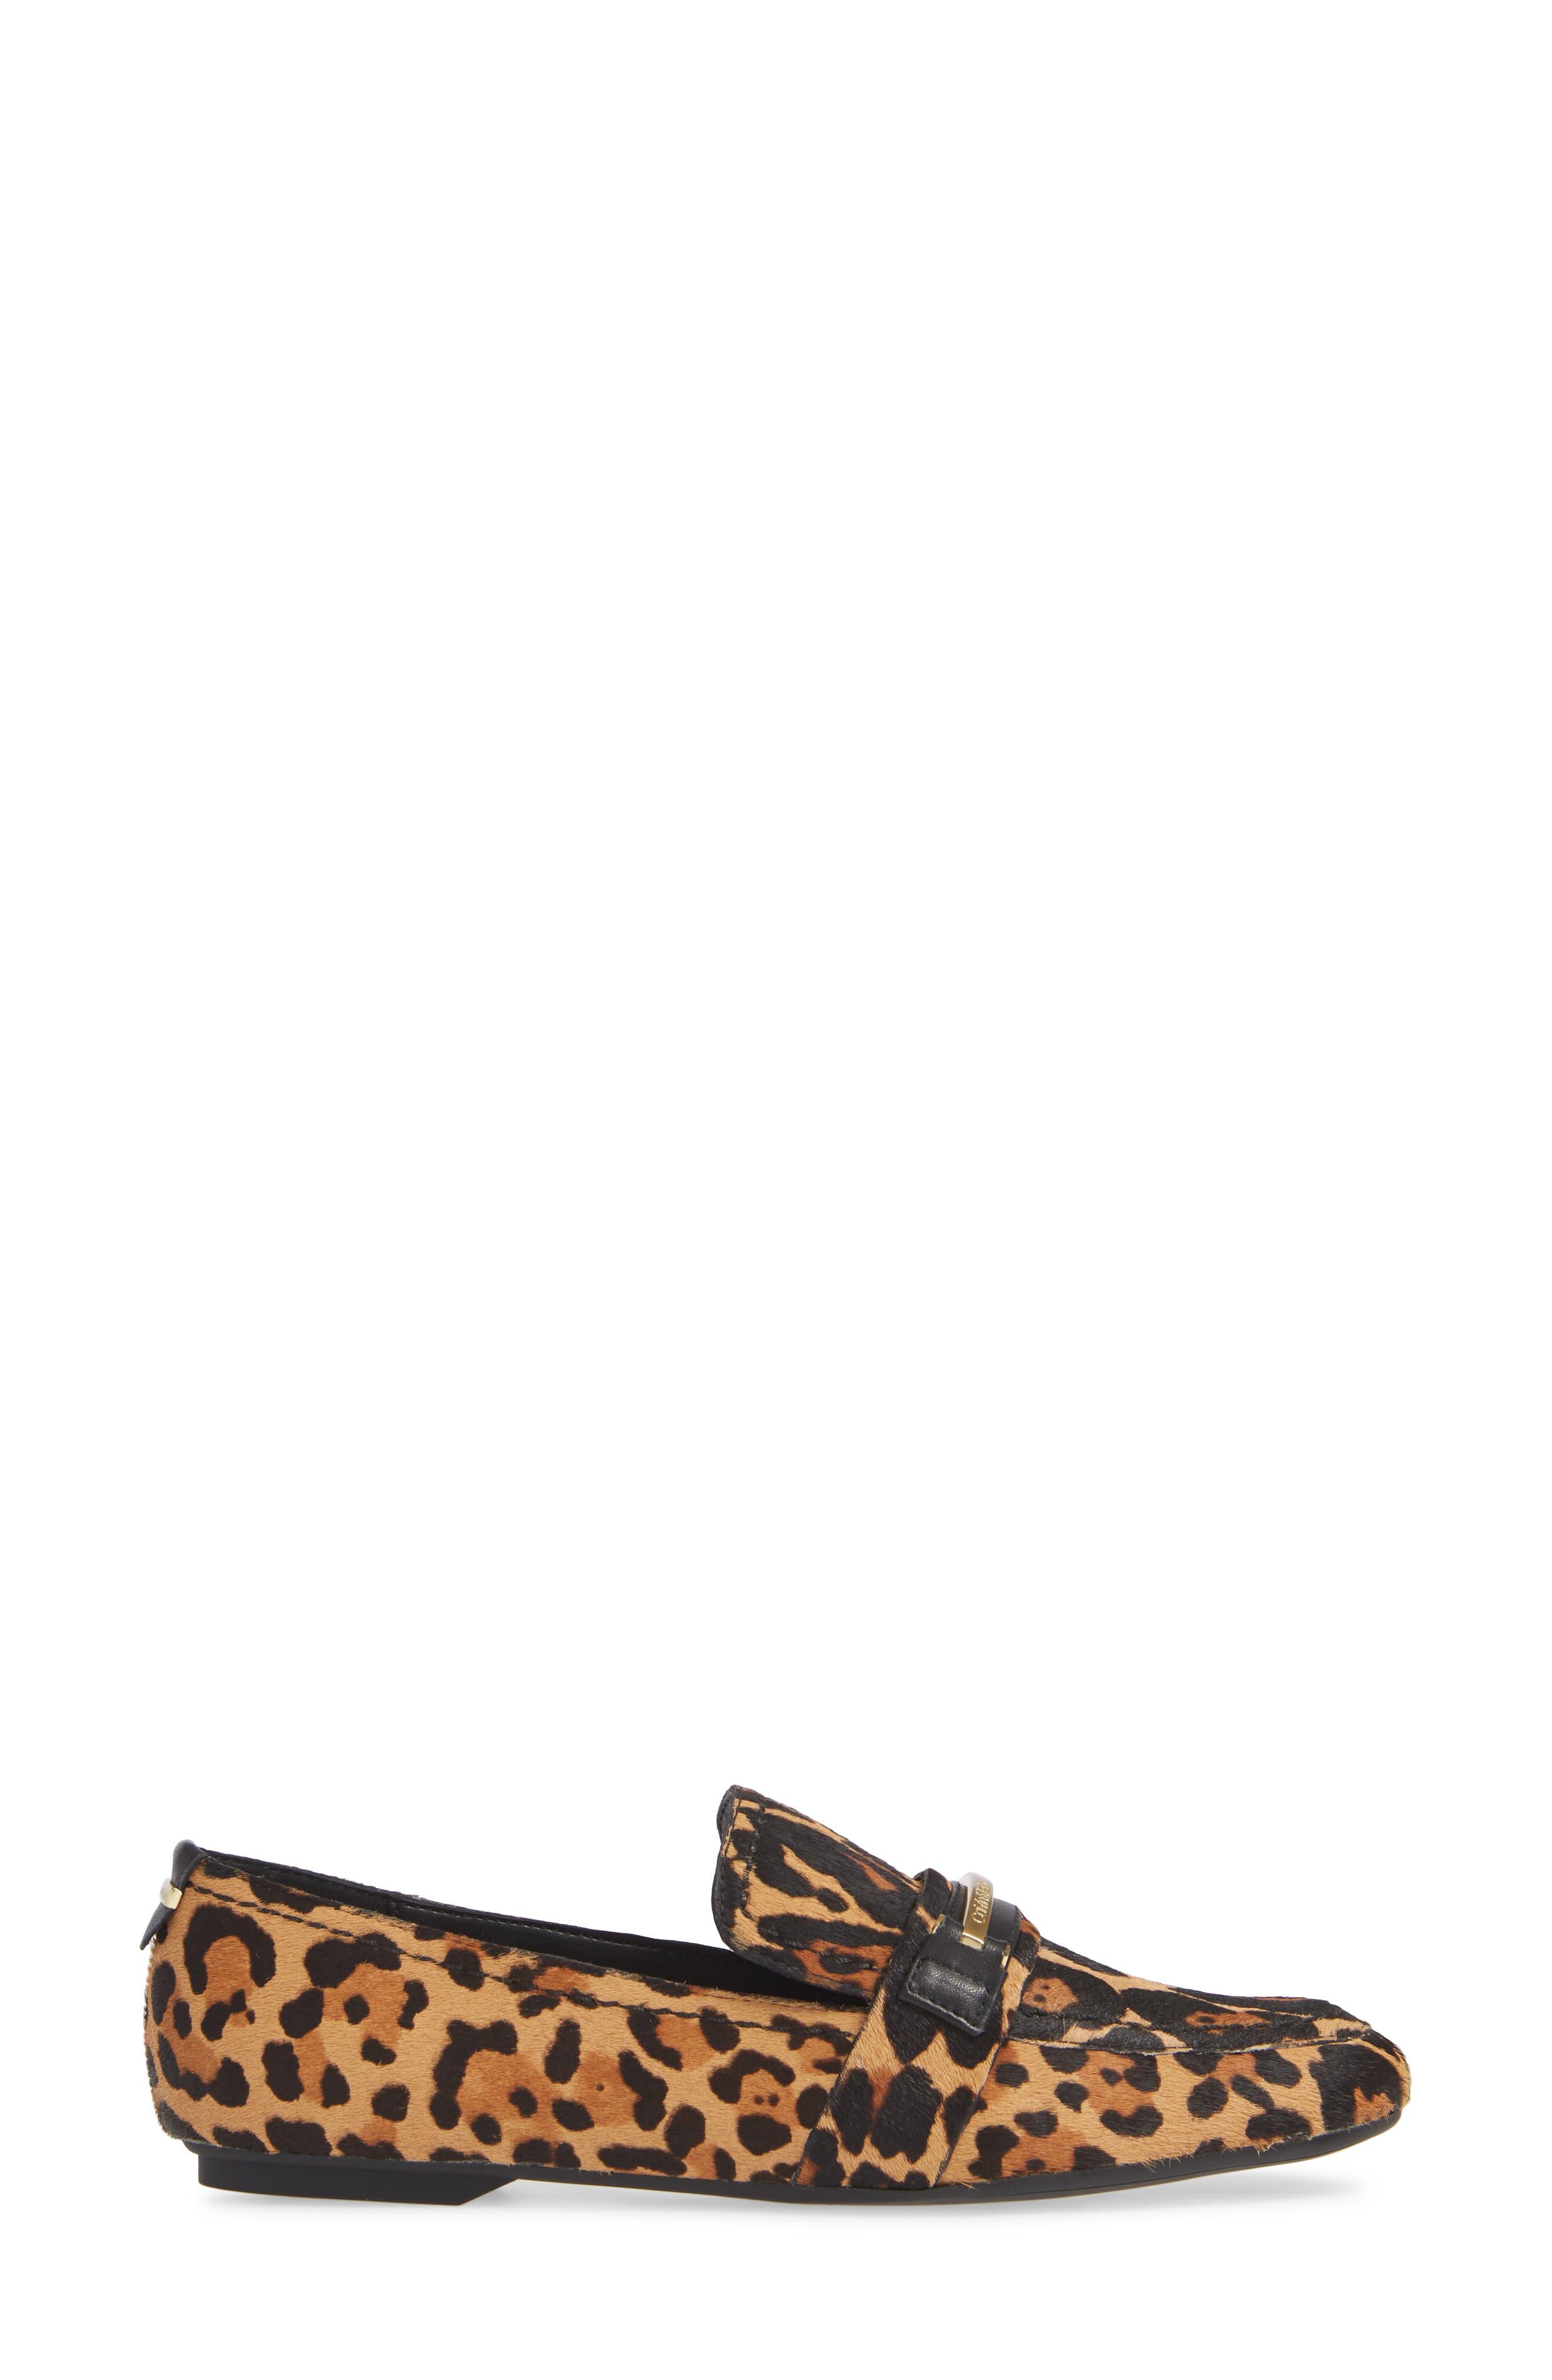 Orianna Genuine Calf Hair Loafer,                             Alternate thumbnail 3, color,                             LEOPARD CALF HAIR